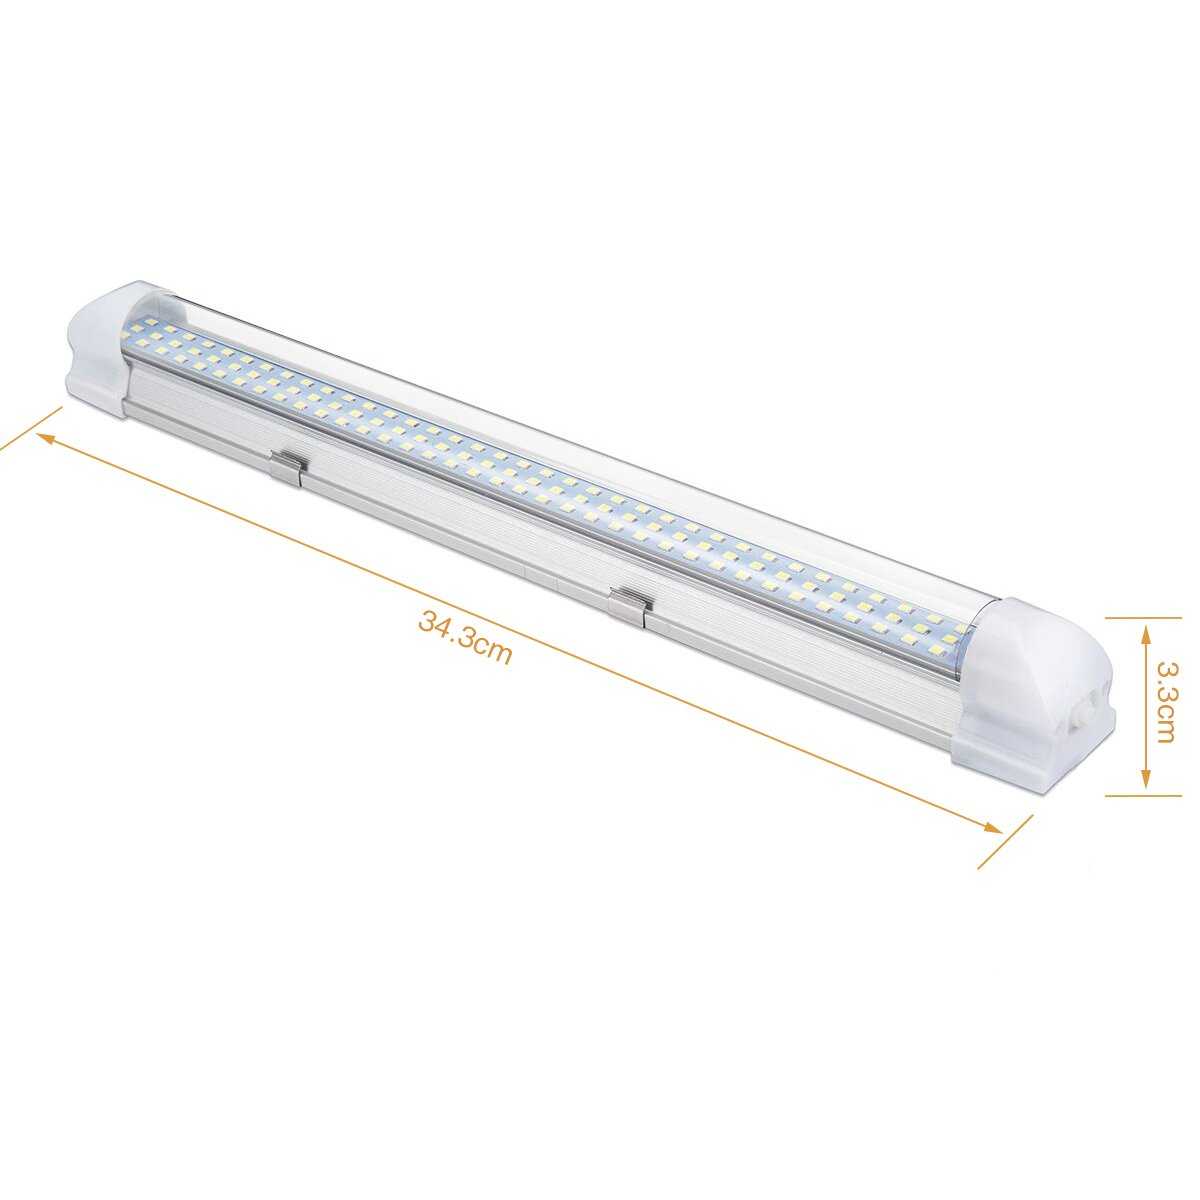 Luci Interne 12V LED Strip Lights 108 LEDs Bar Lampada Illuminazione Universale DC12V 4W per Auto Camper Van Bus Caravan Boat Motorhome Cucina Bagno 340 MM ON//off Interruttore 72LED